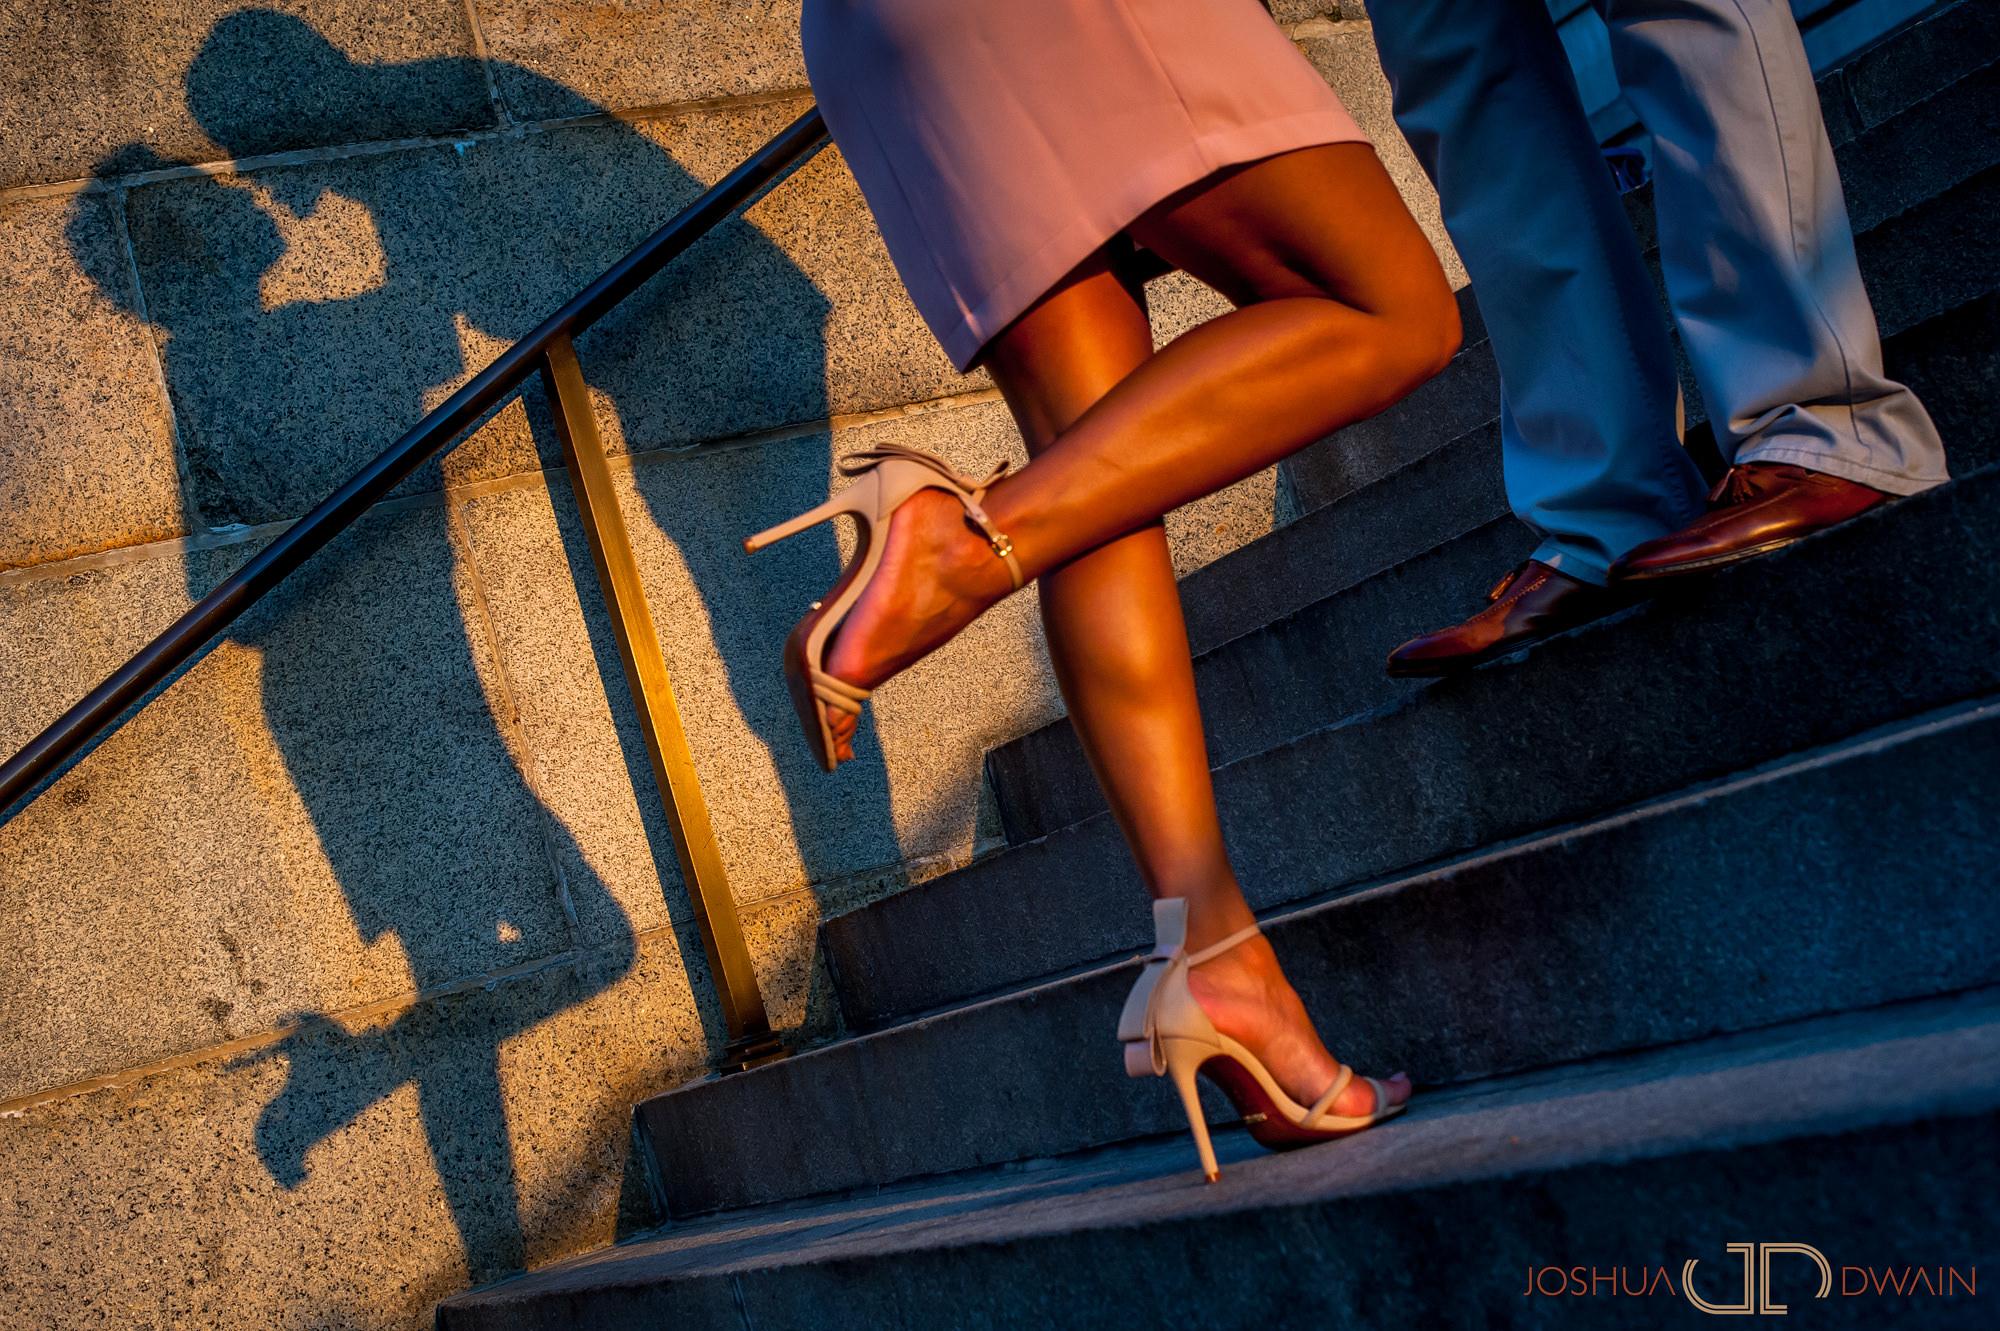 monique-lloyd-004-washington-dc-engagement-photographer-joshua-dwain